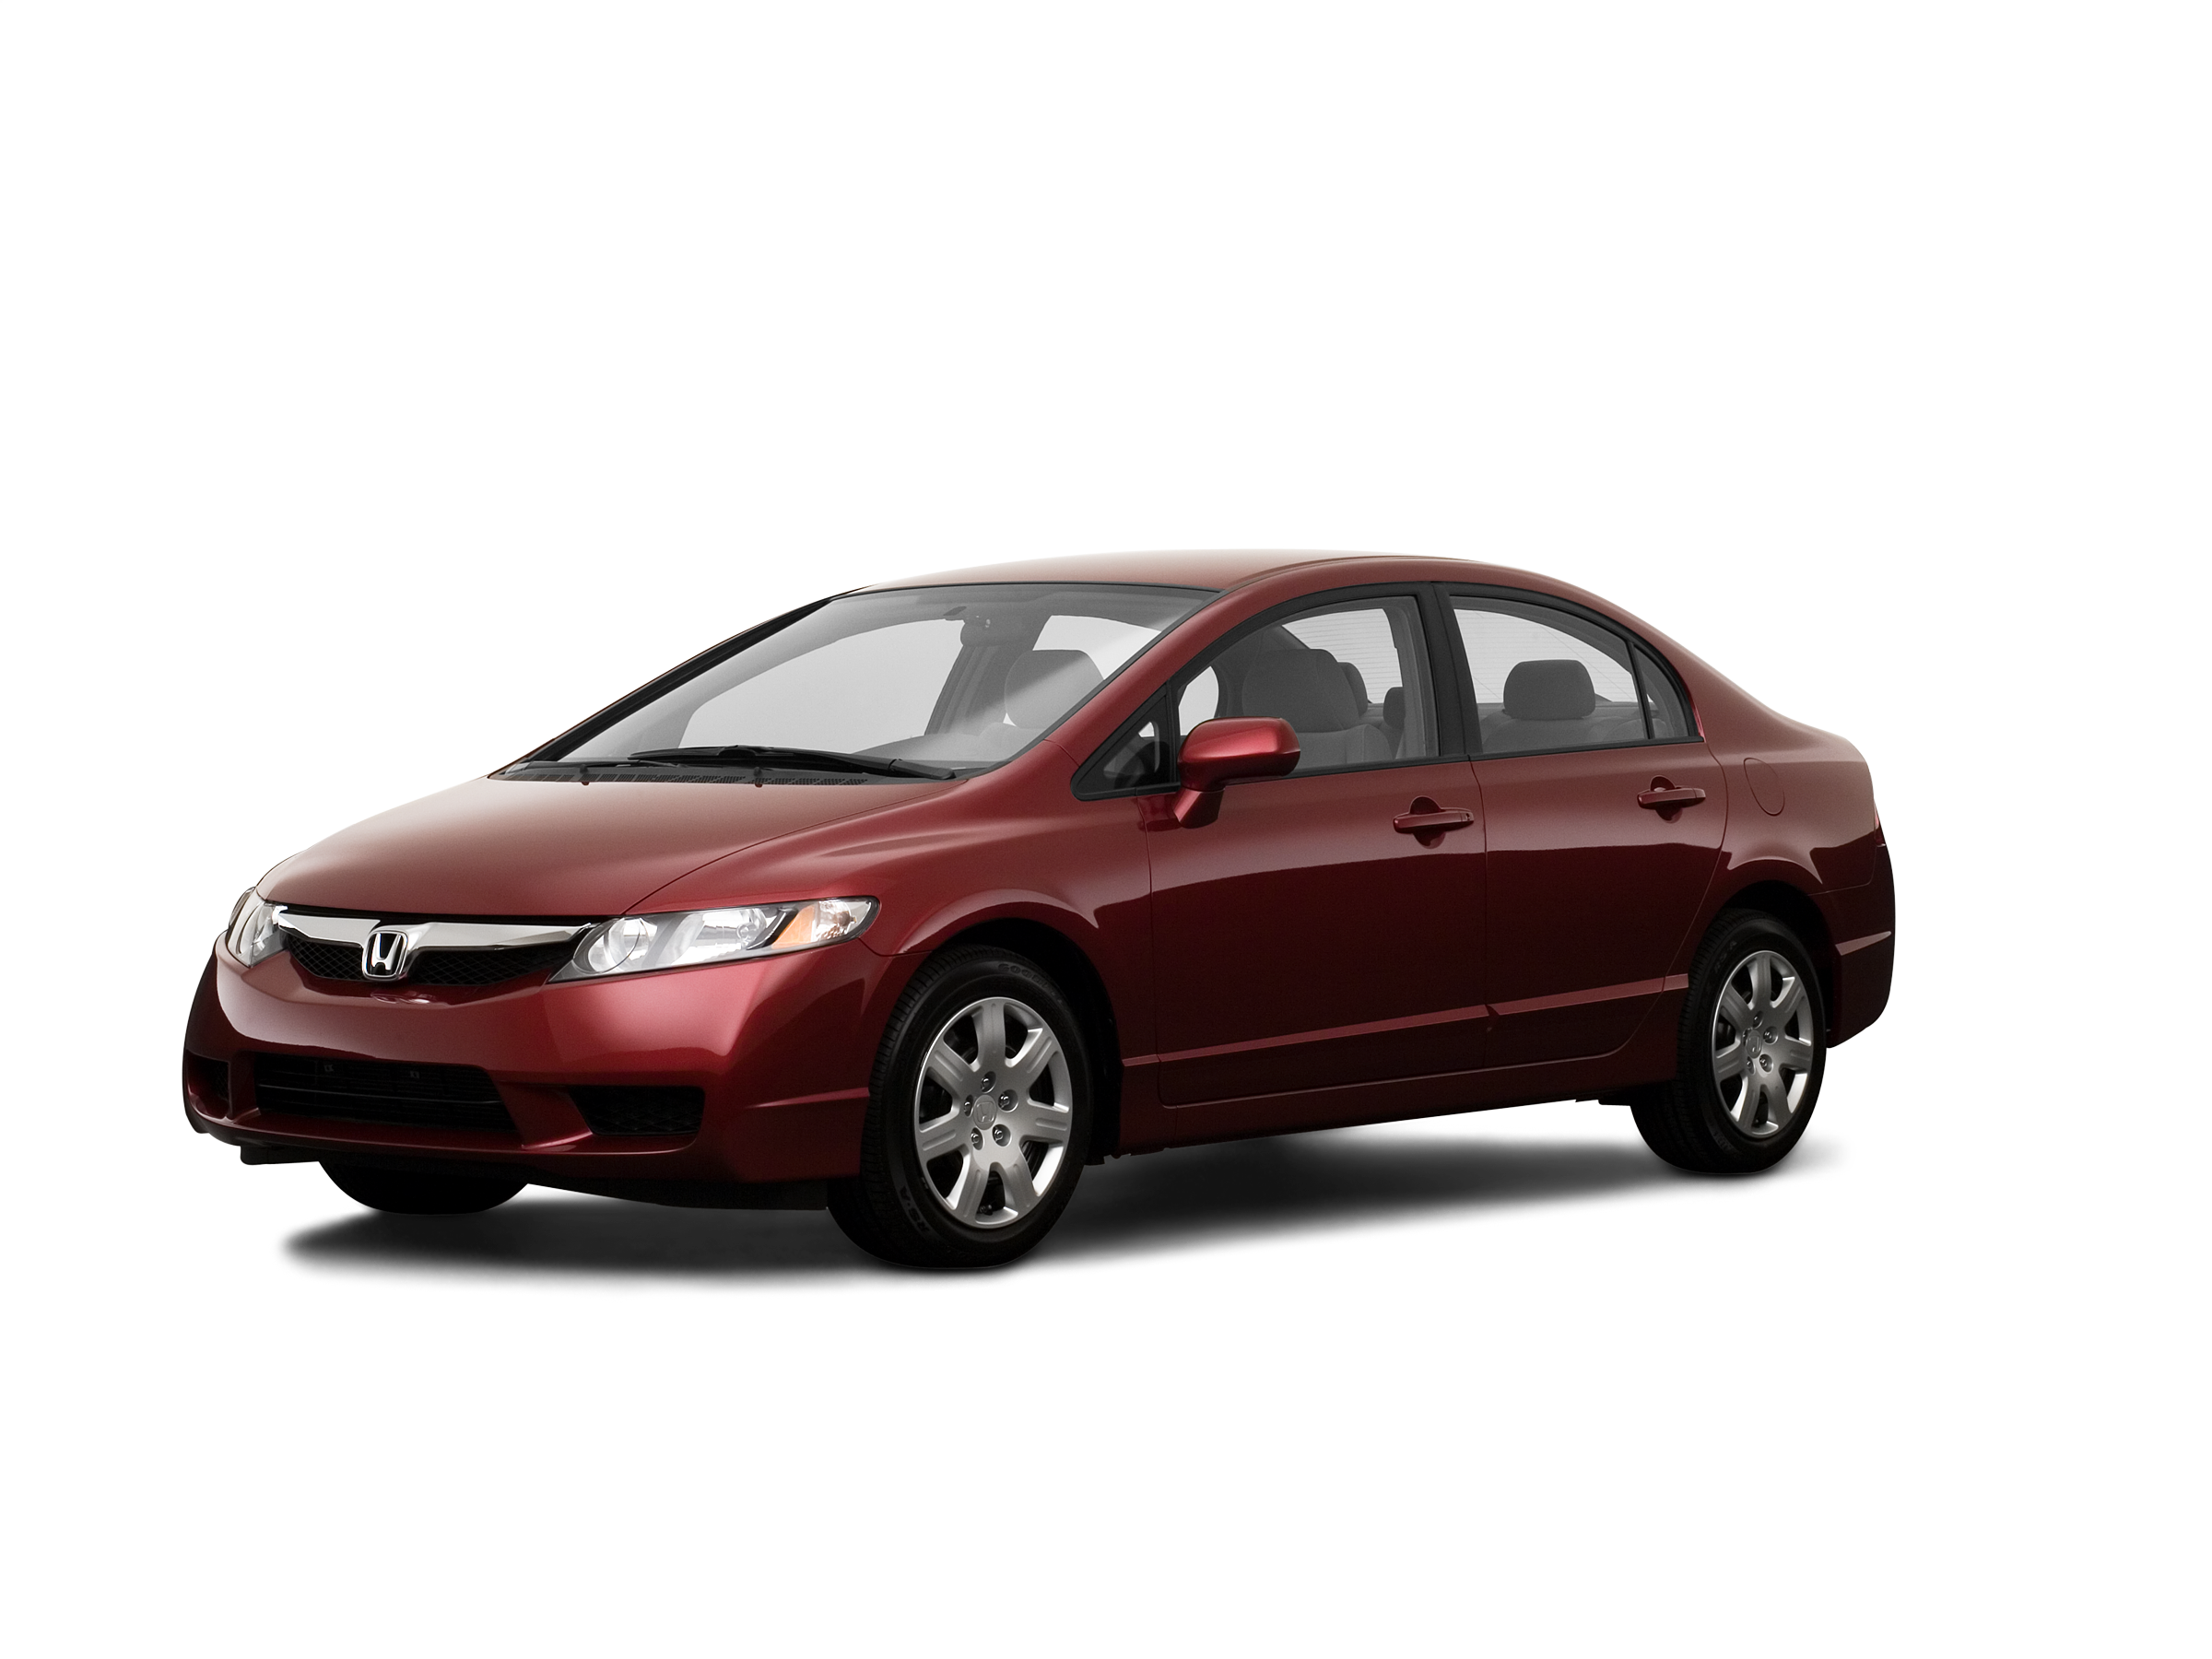 2009 Honda Civic Values Cars For Sale Kelley Blue Book